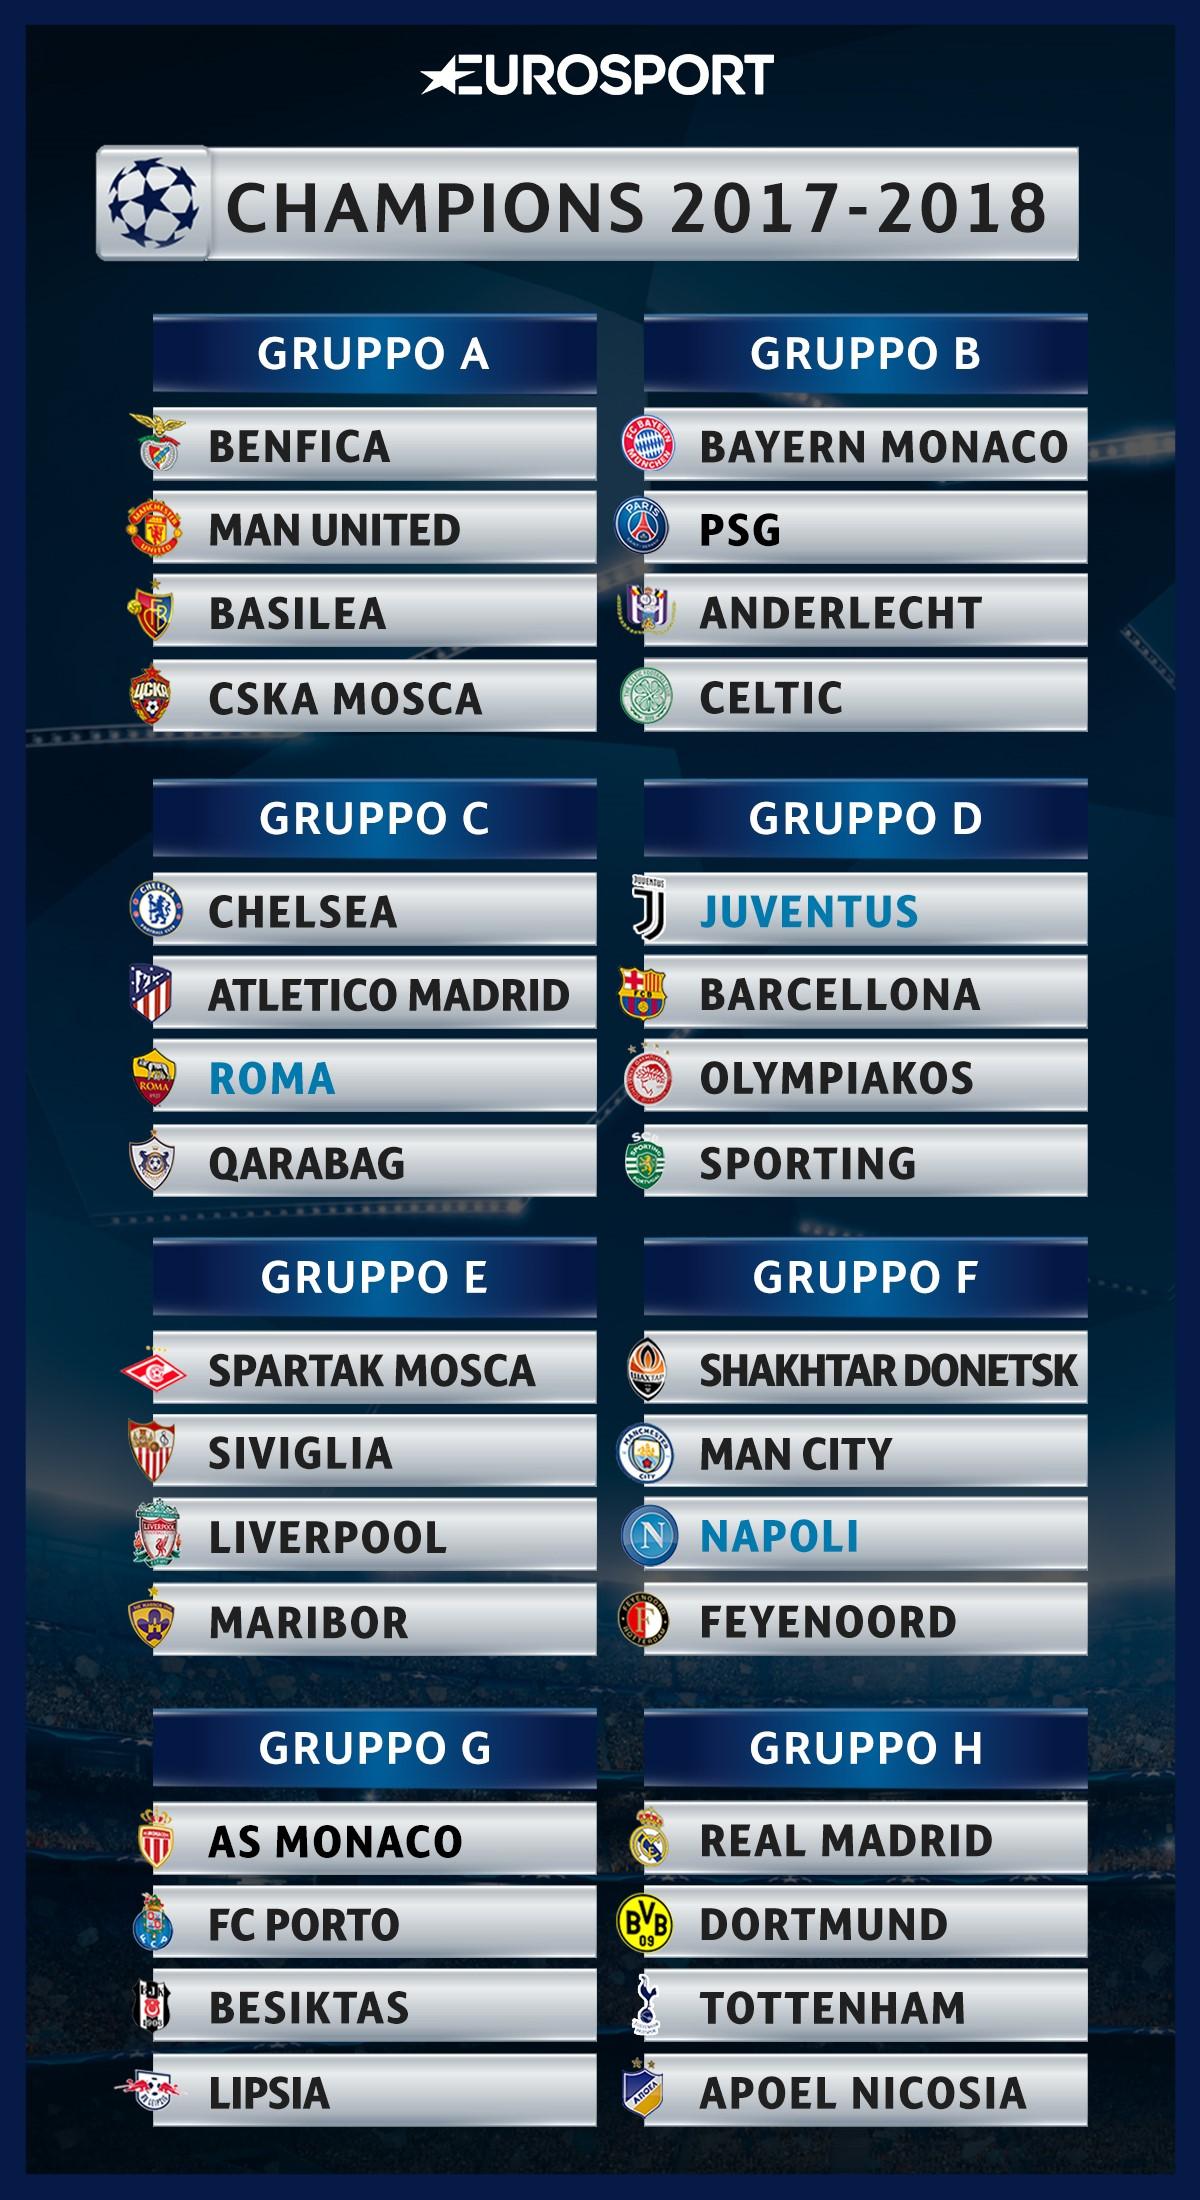 Champions Calendario Juve.Sorteggio Gironi Champions Juventus Barcellona Napoli